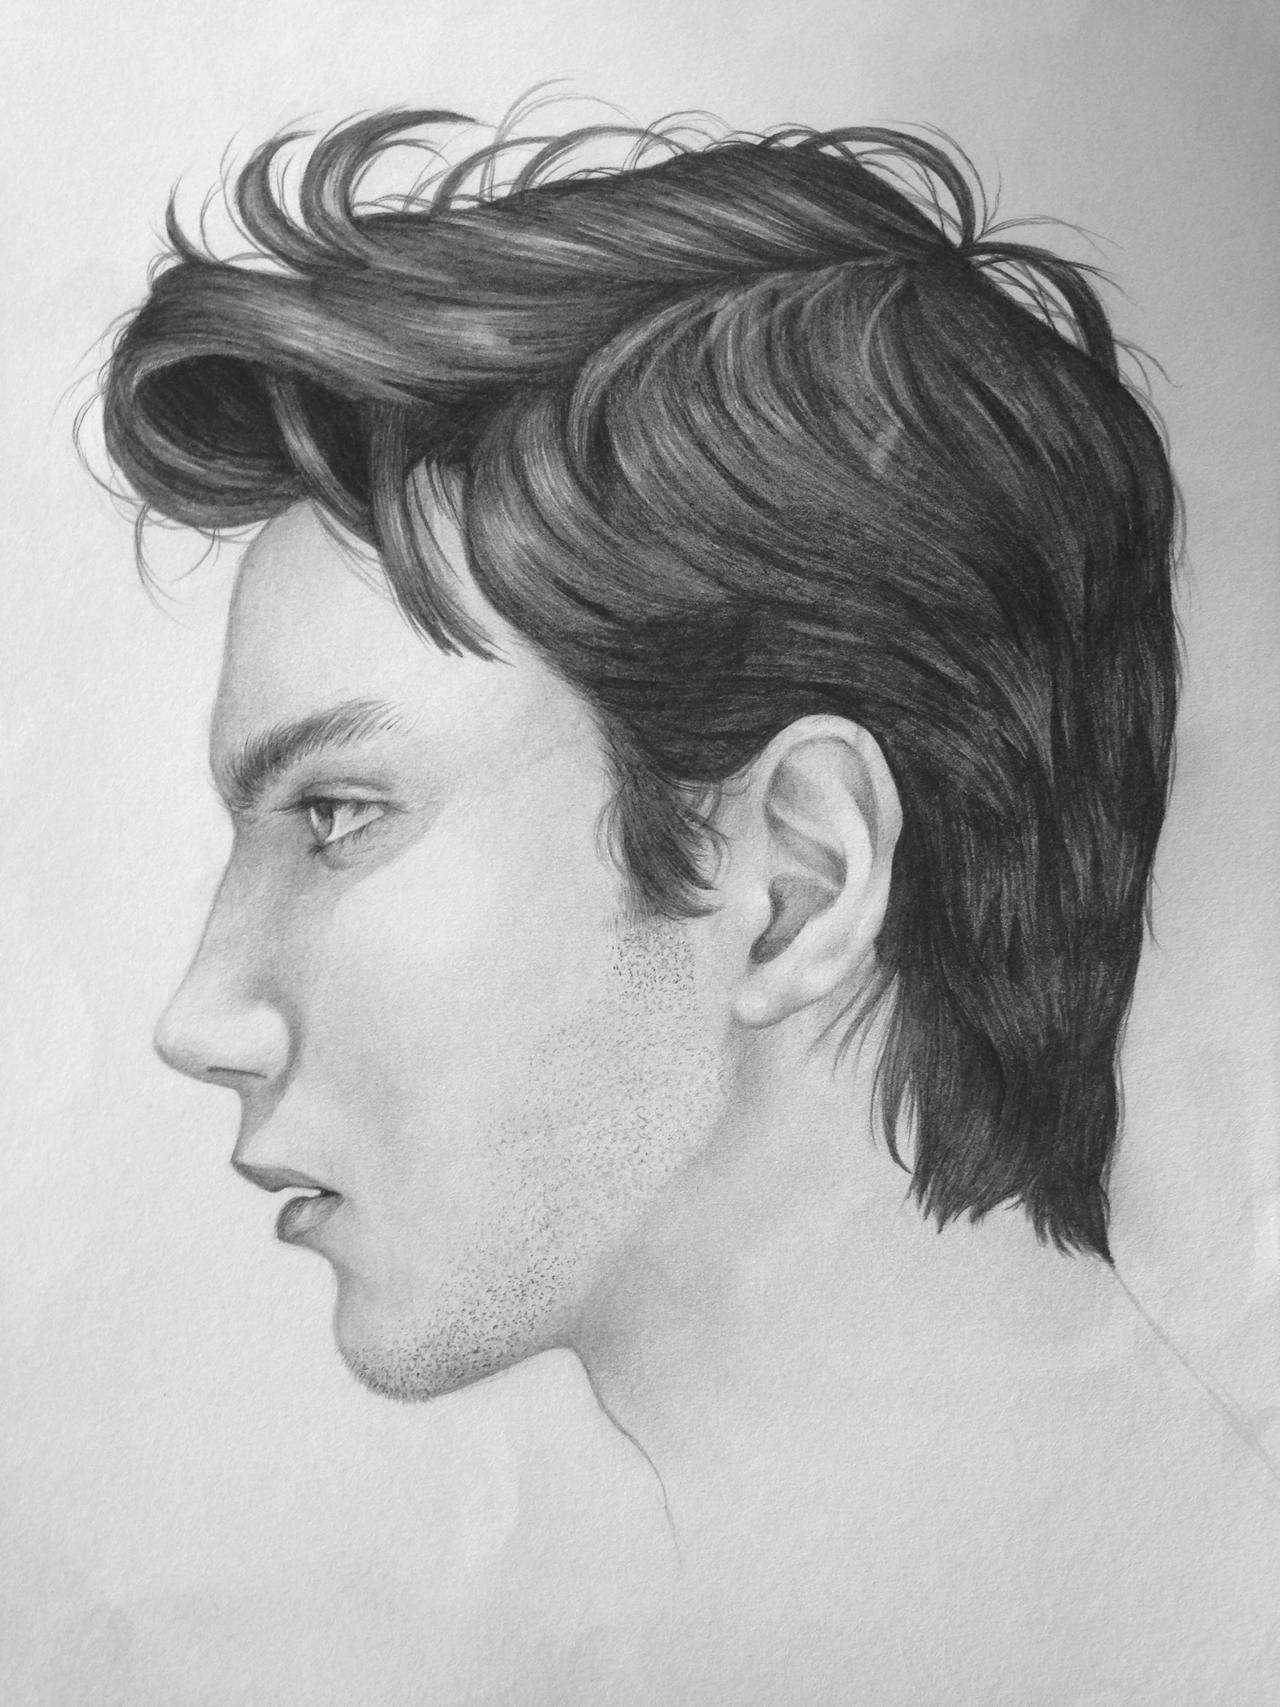 Side Portrait of myself by hamood96 on DeviantArt